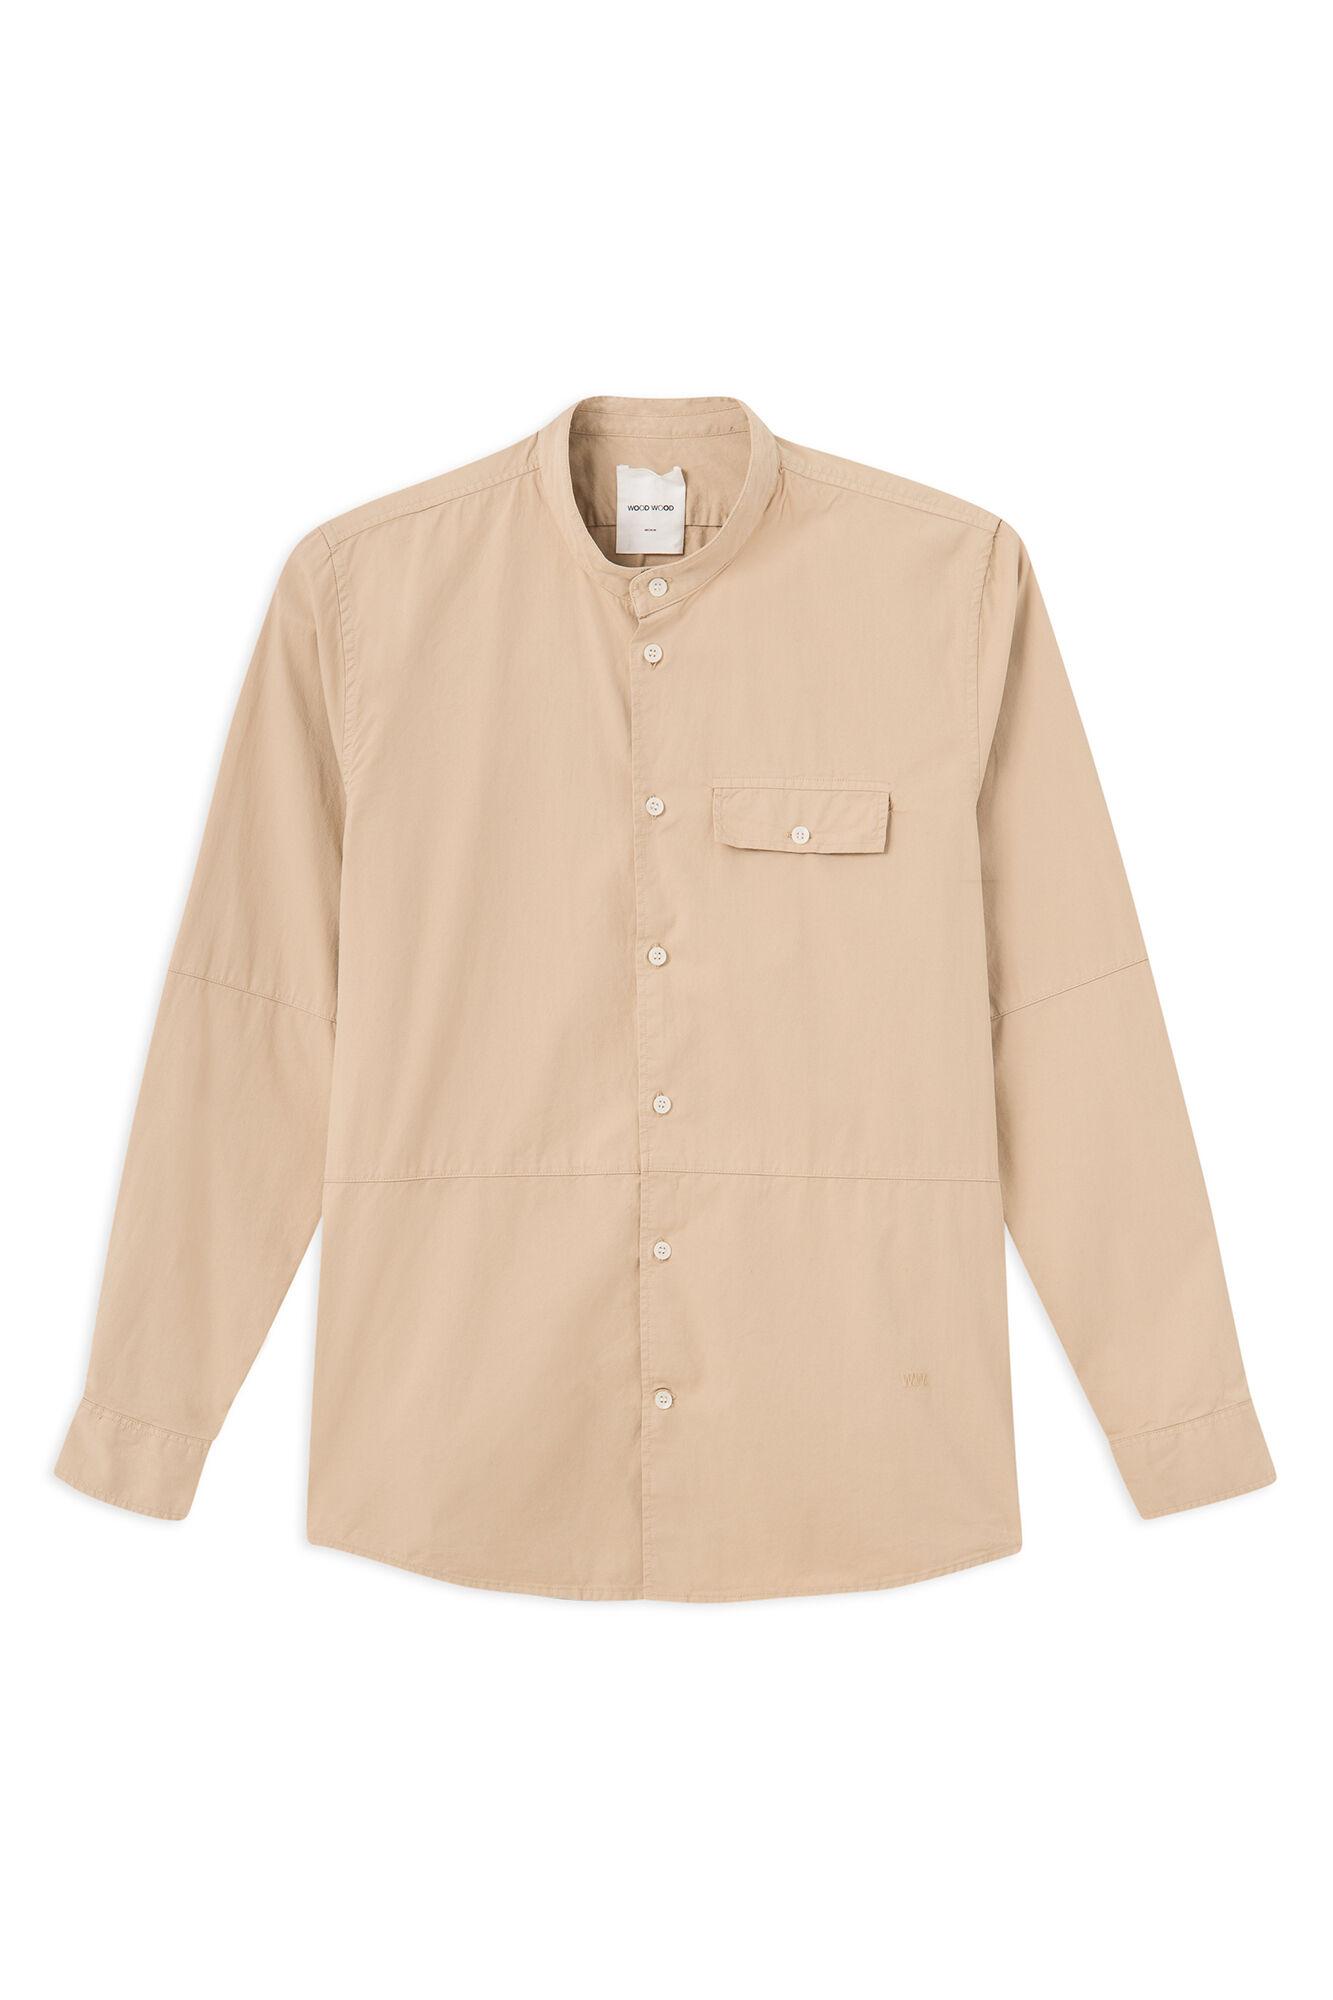 Alvaro shirt 11915311-1152, LIGHT KHAKI